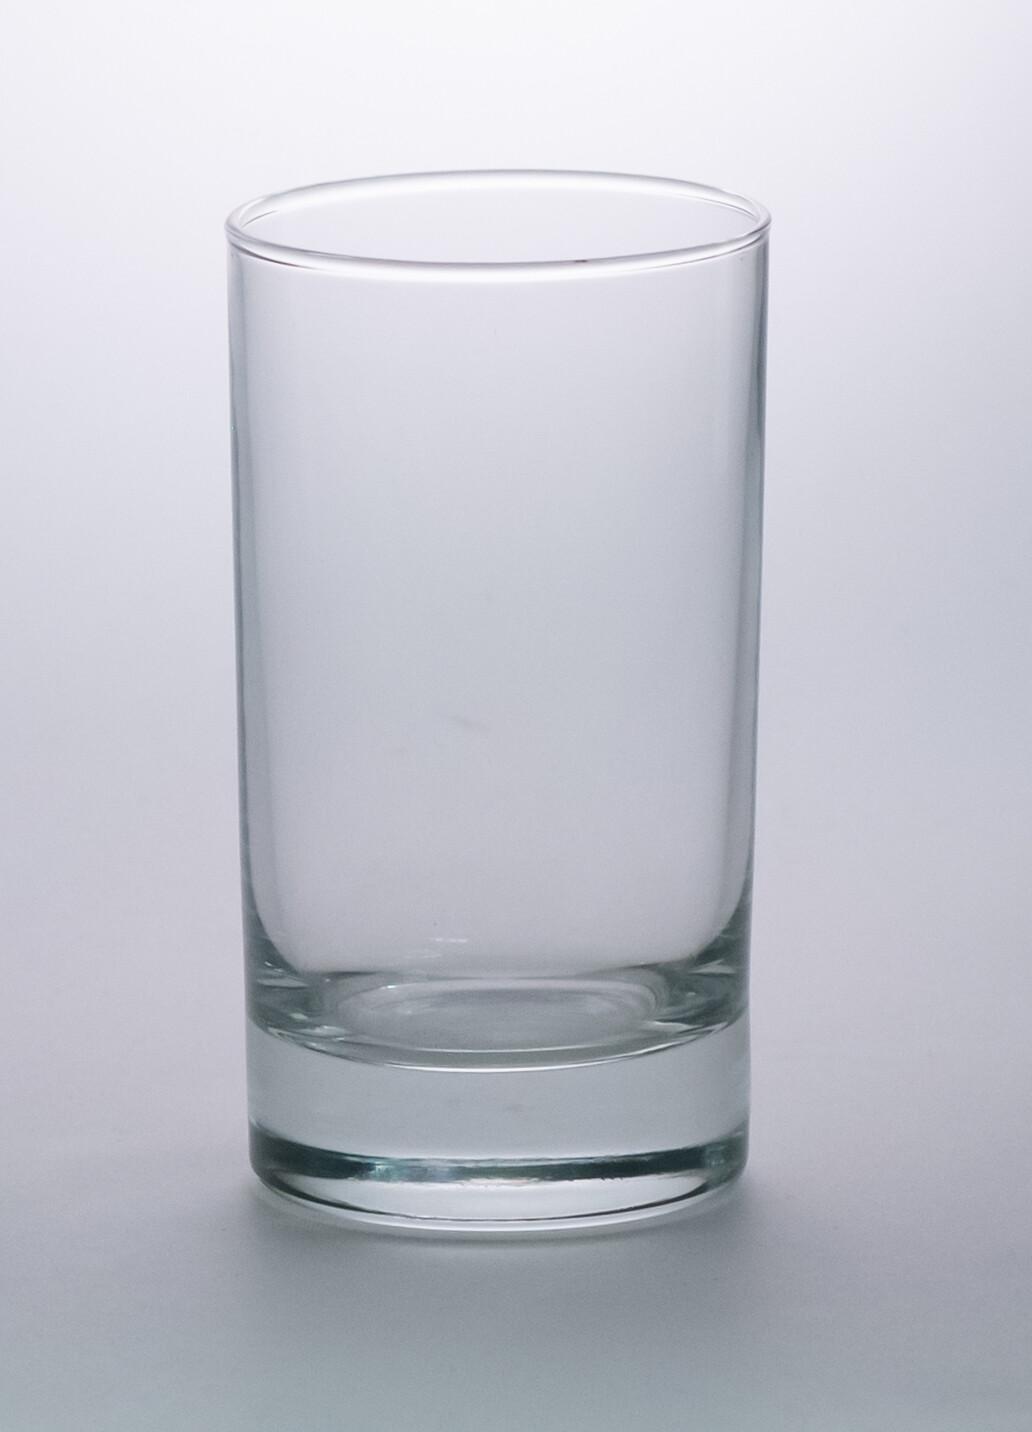 Vaso 11 ½ oz.